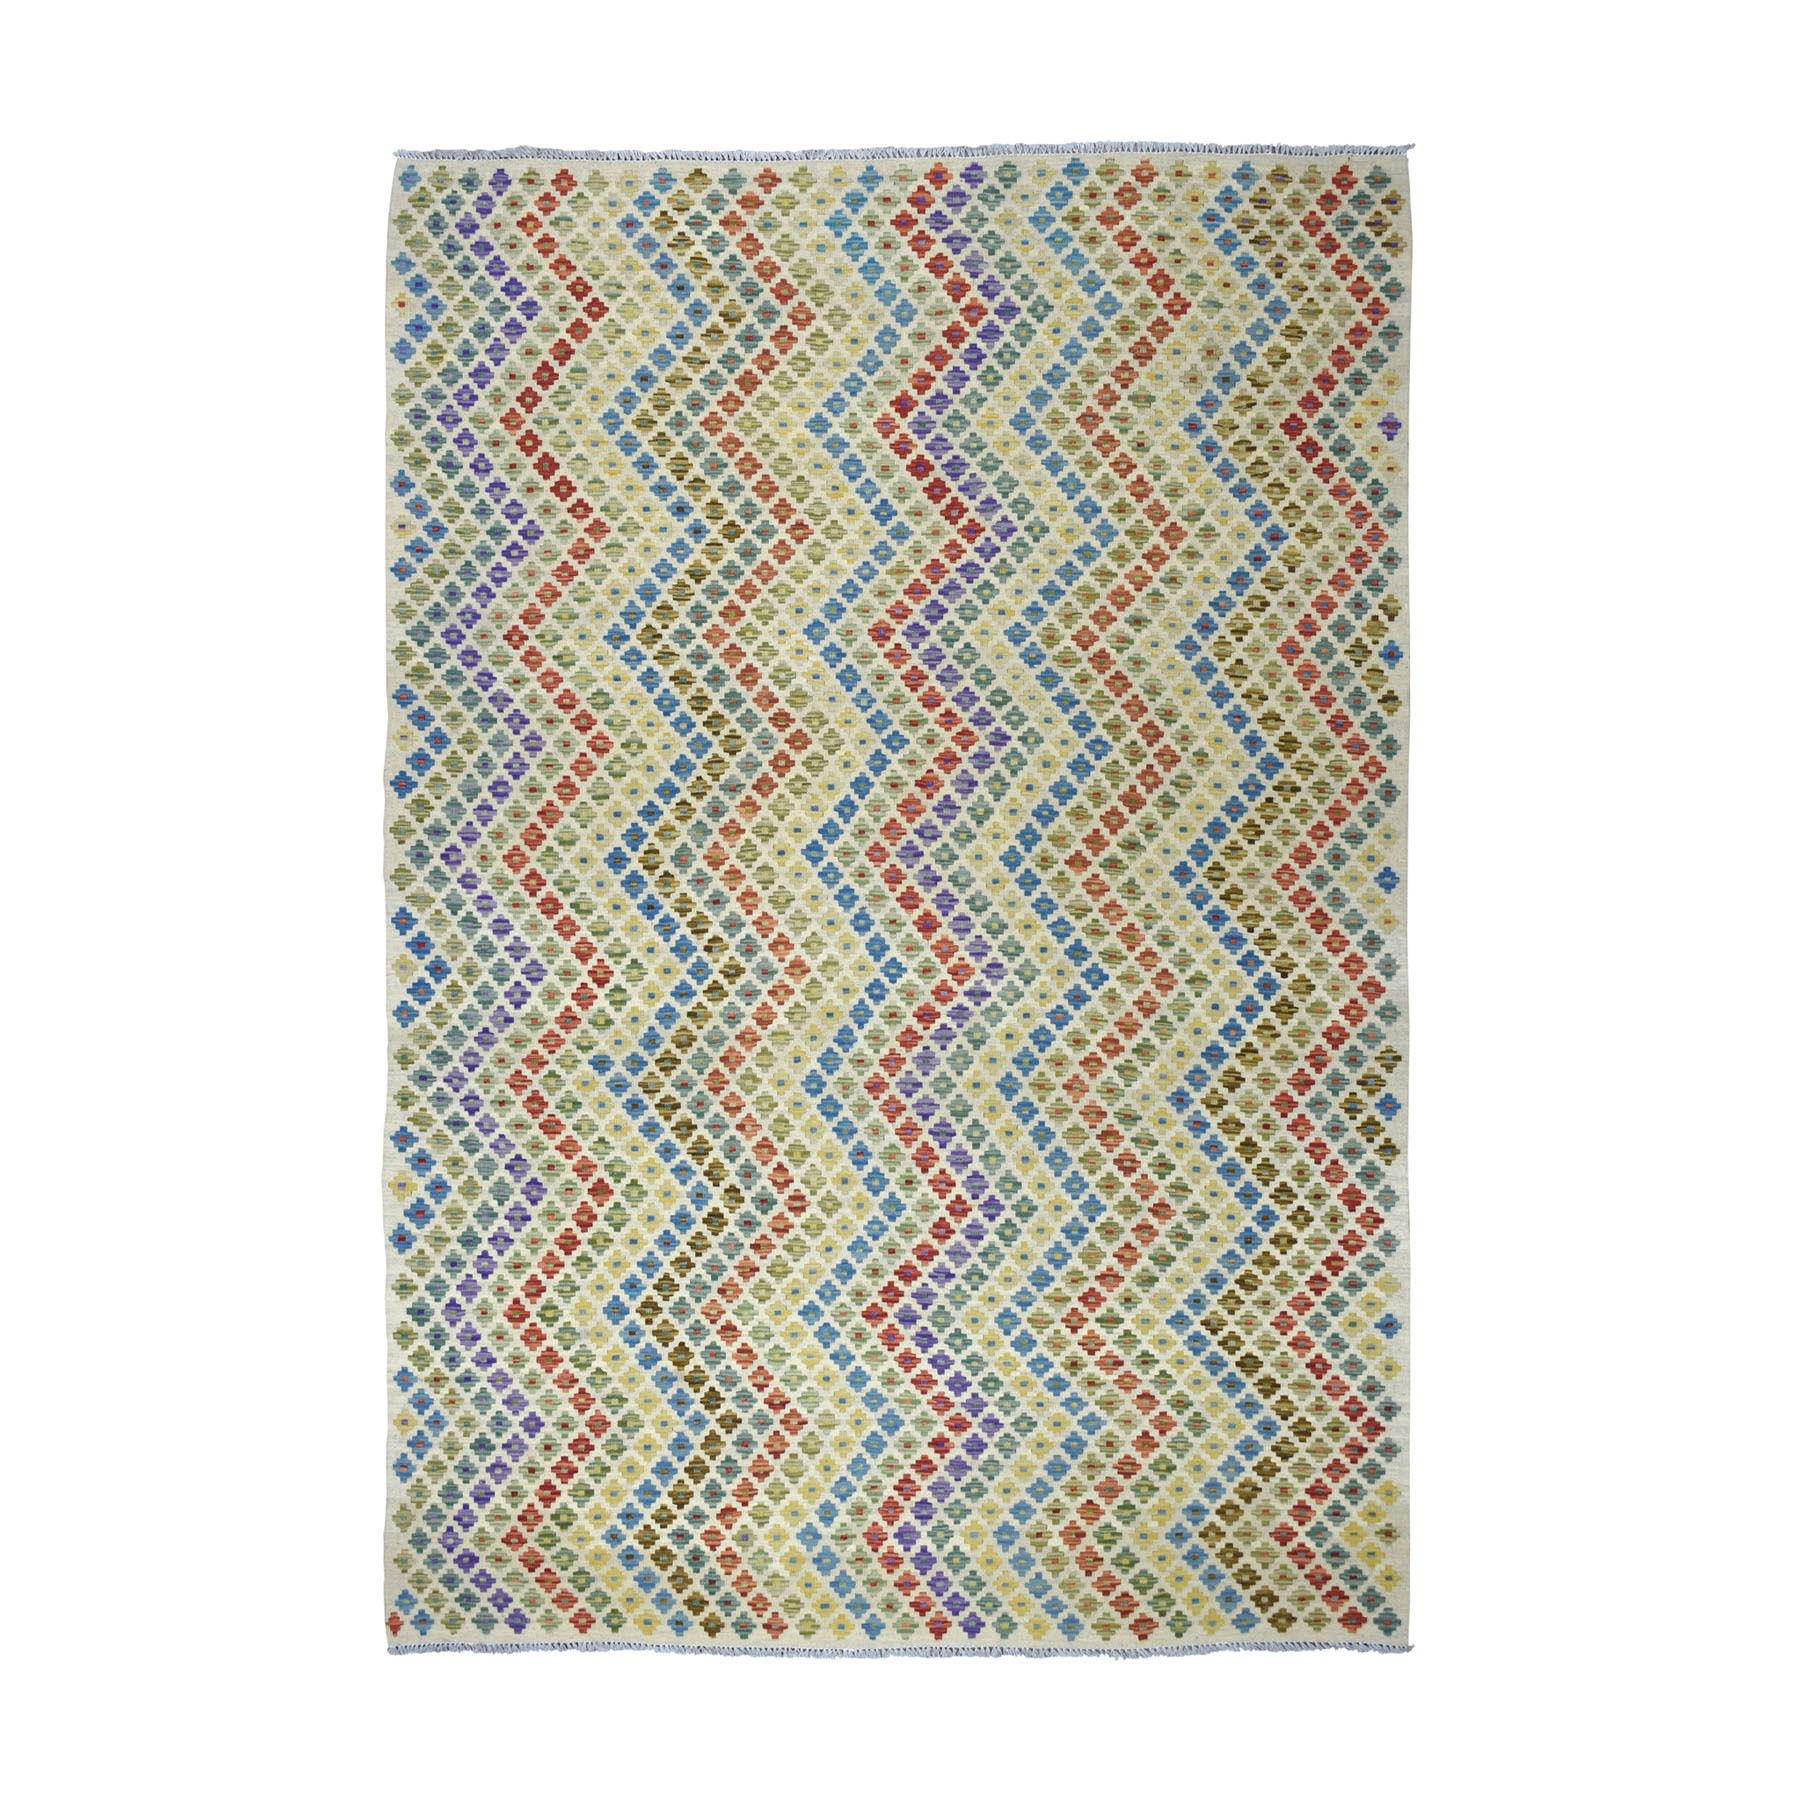 "6'9""x9'6"" Colorful Afghan Kilim Pure Wool Hand Woven Oriental Rug"